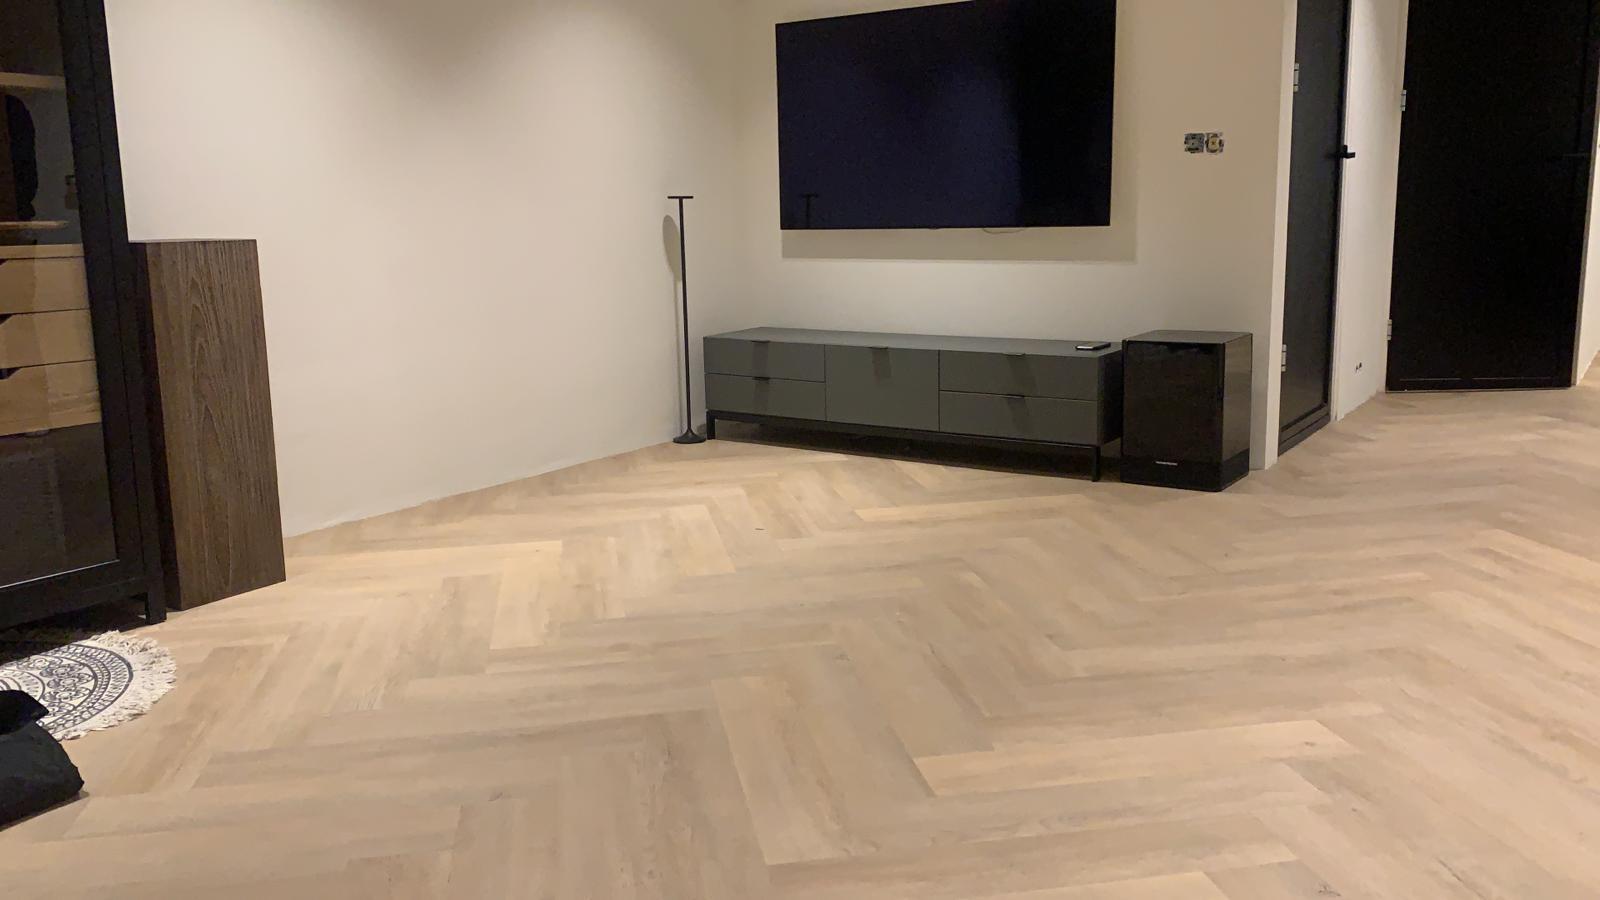 60 m² Visgraat Palazzo XL71 Plak-pvc te Diemen